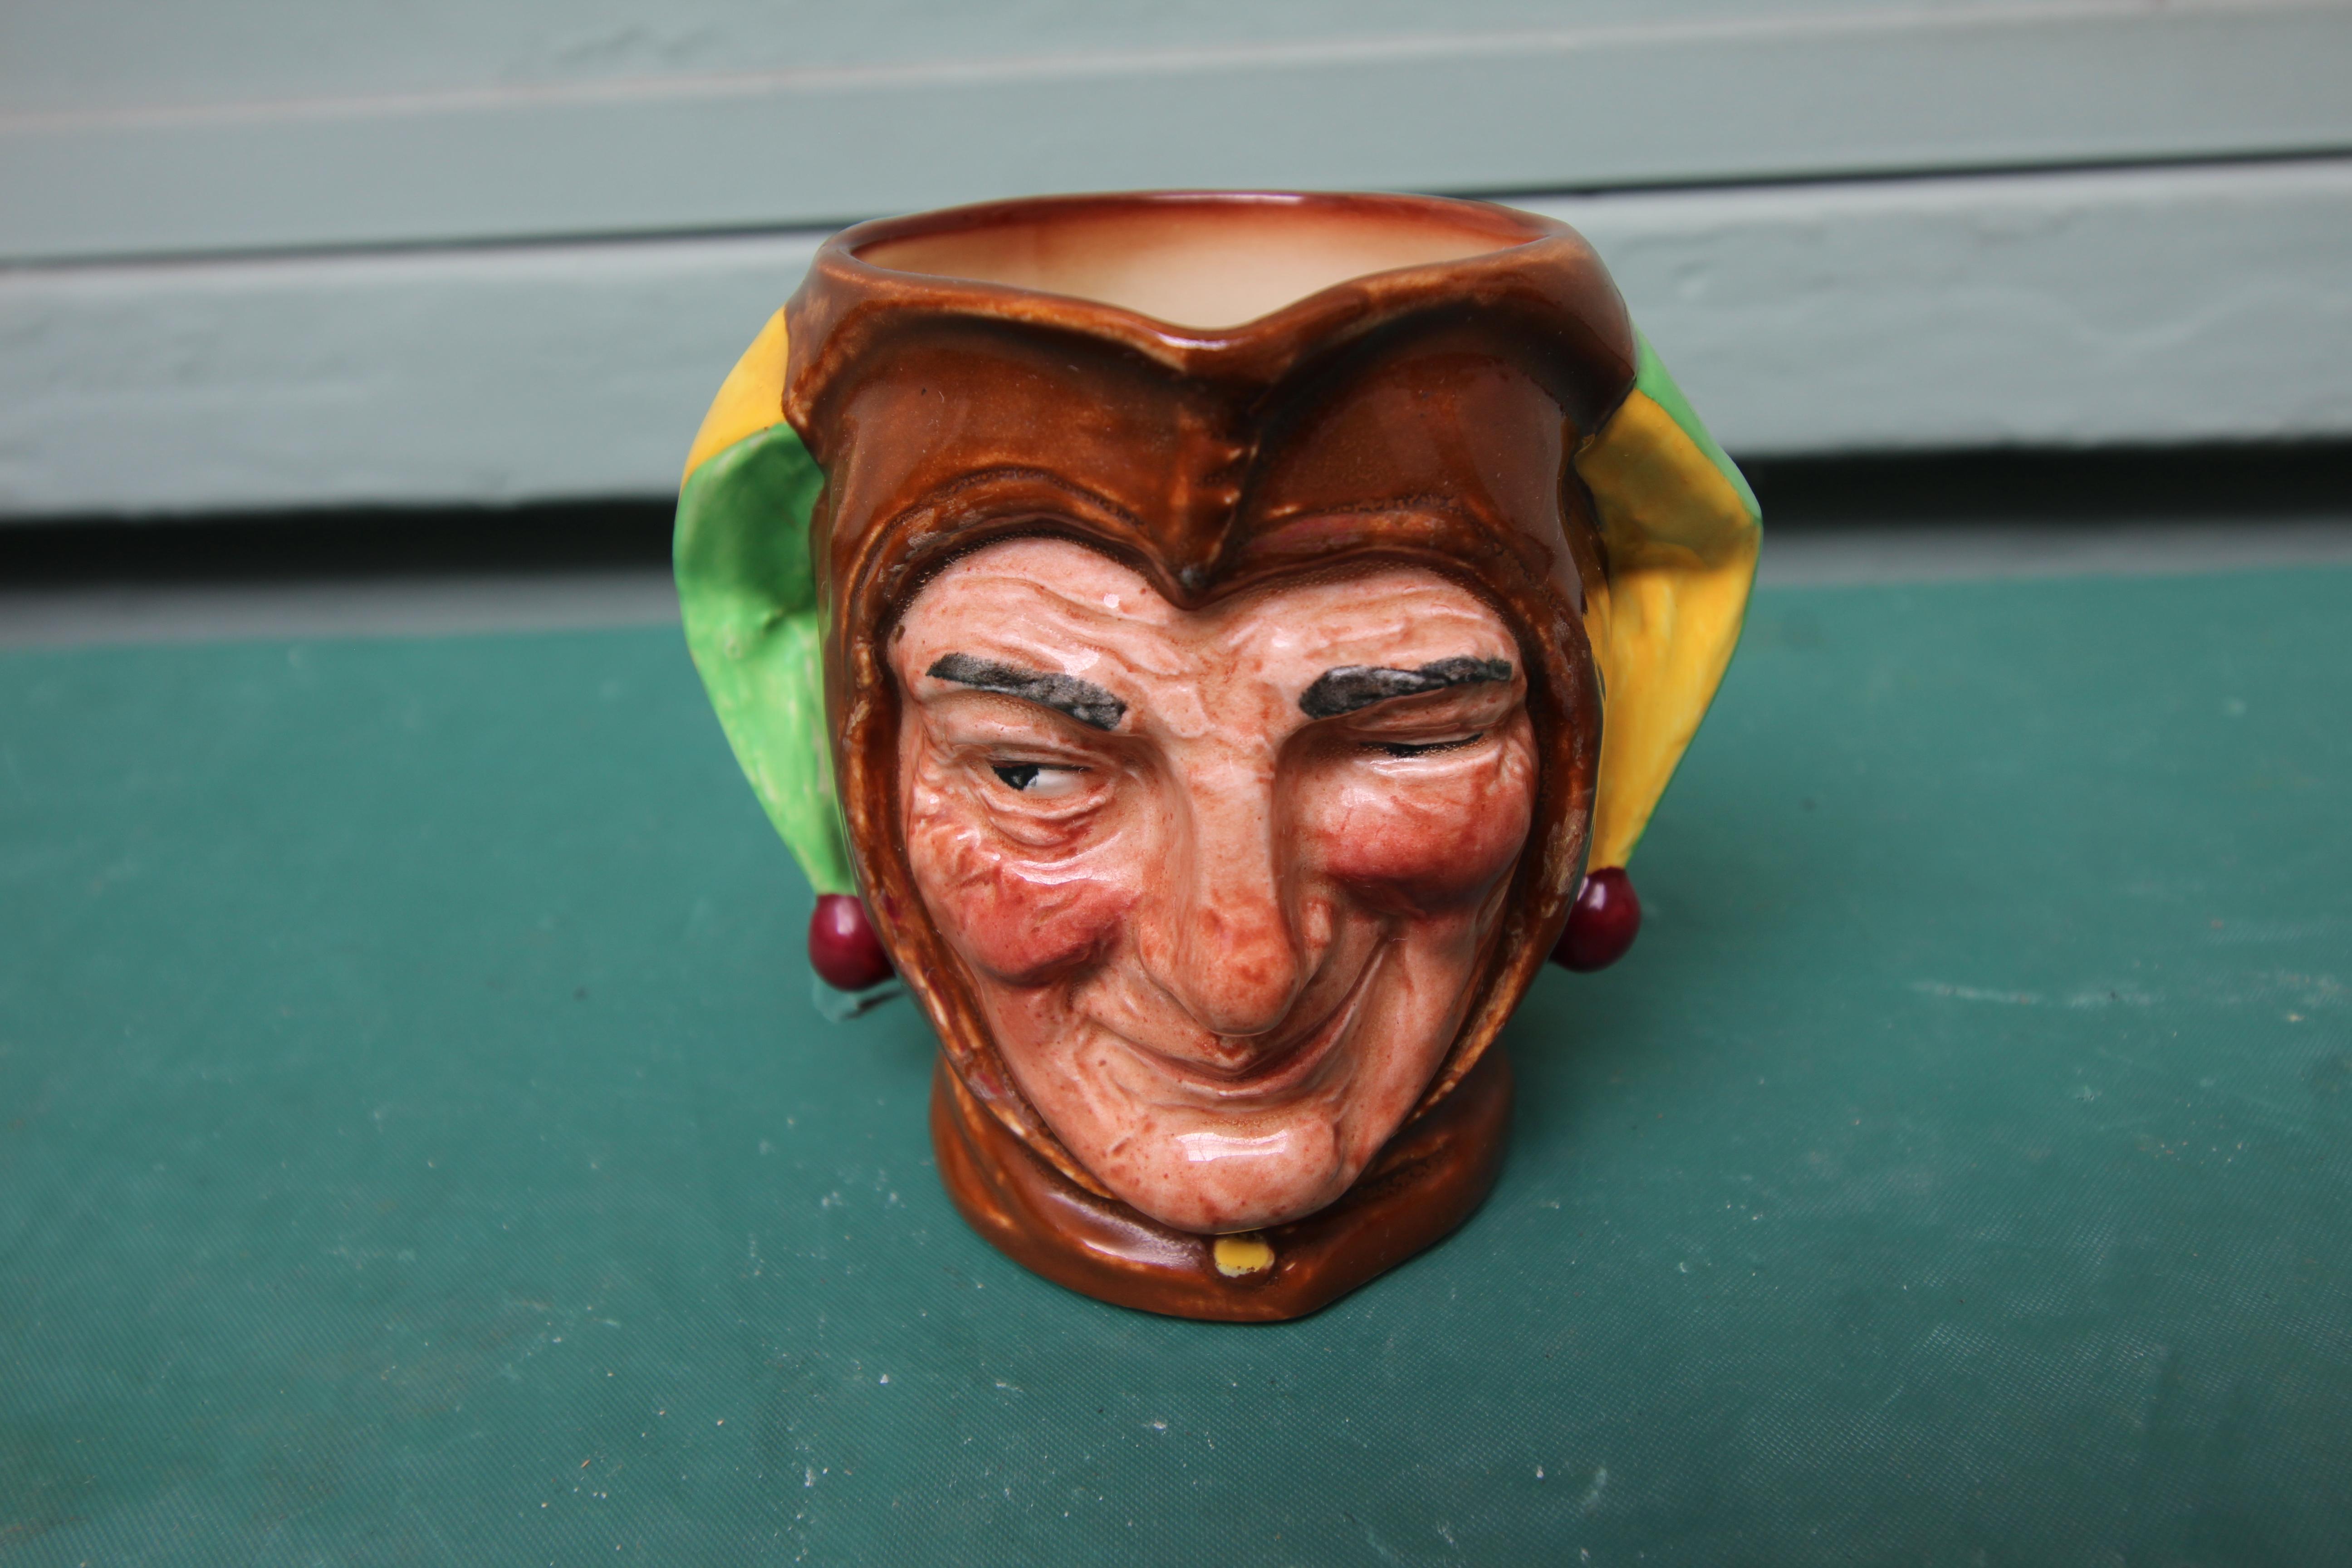 5 miniature Royal Doulton character jugs incl. Gone away, Sairey Gamp, Neptune etc. - Image 4 of 4